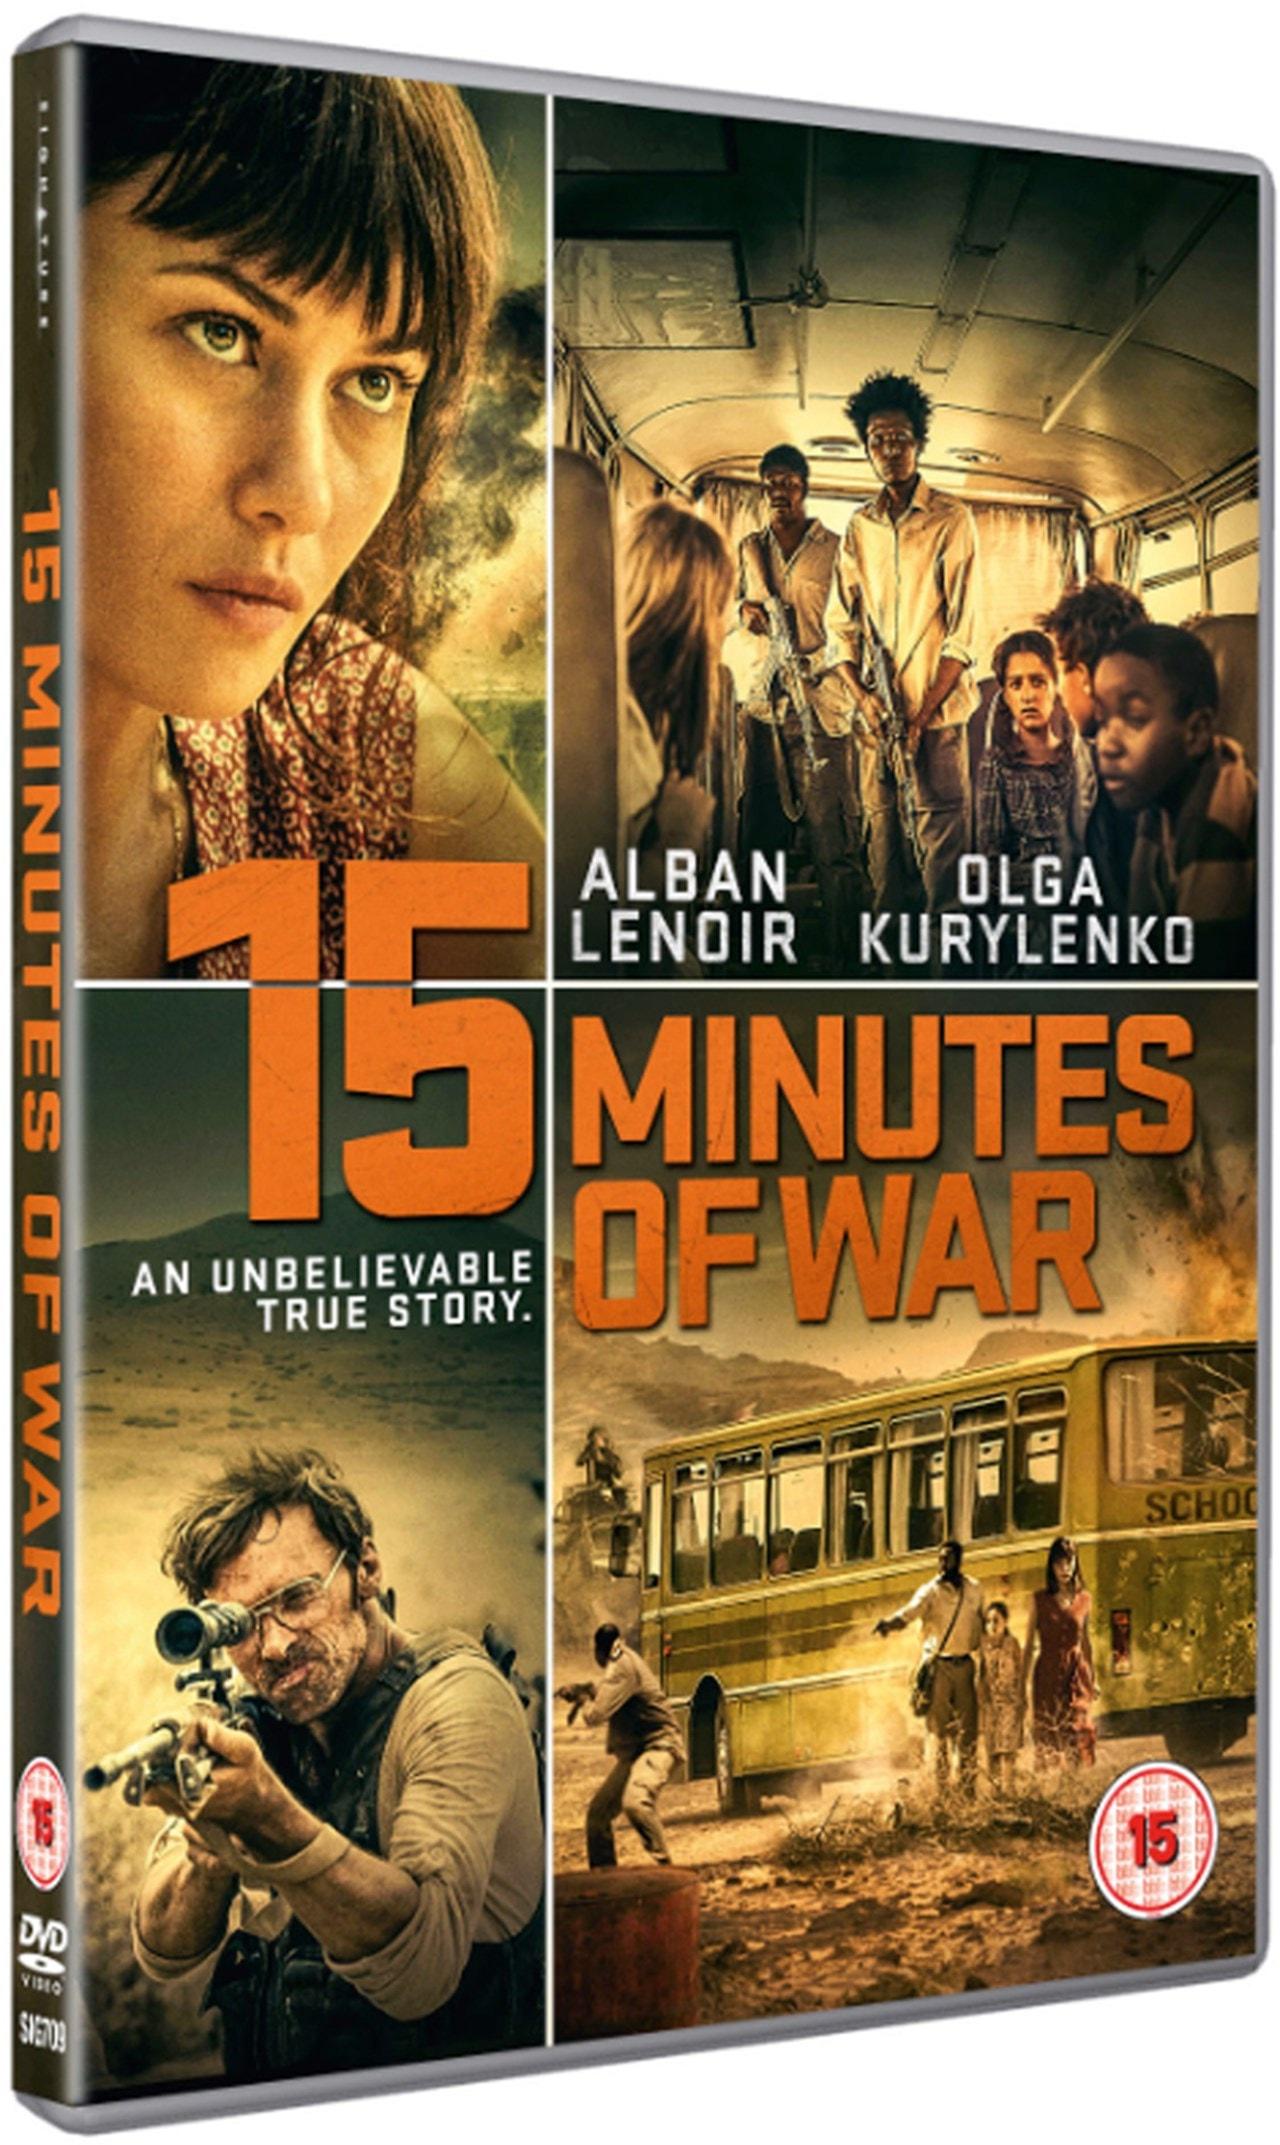 15 Minutes of War - 2